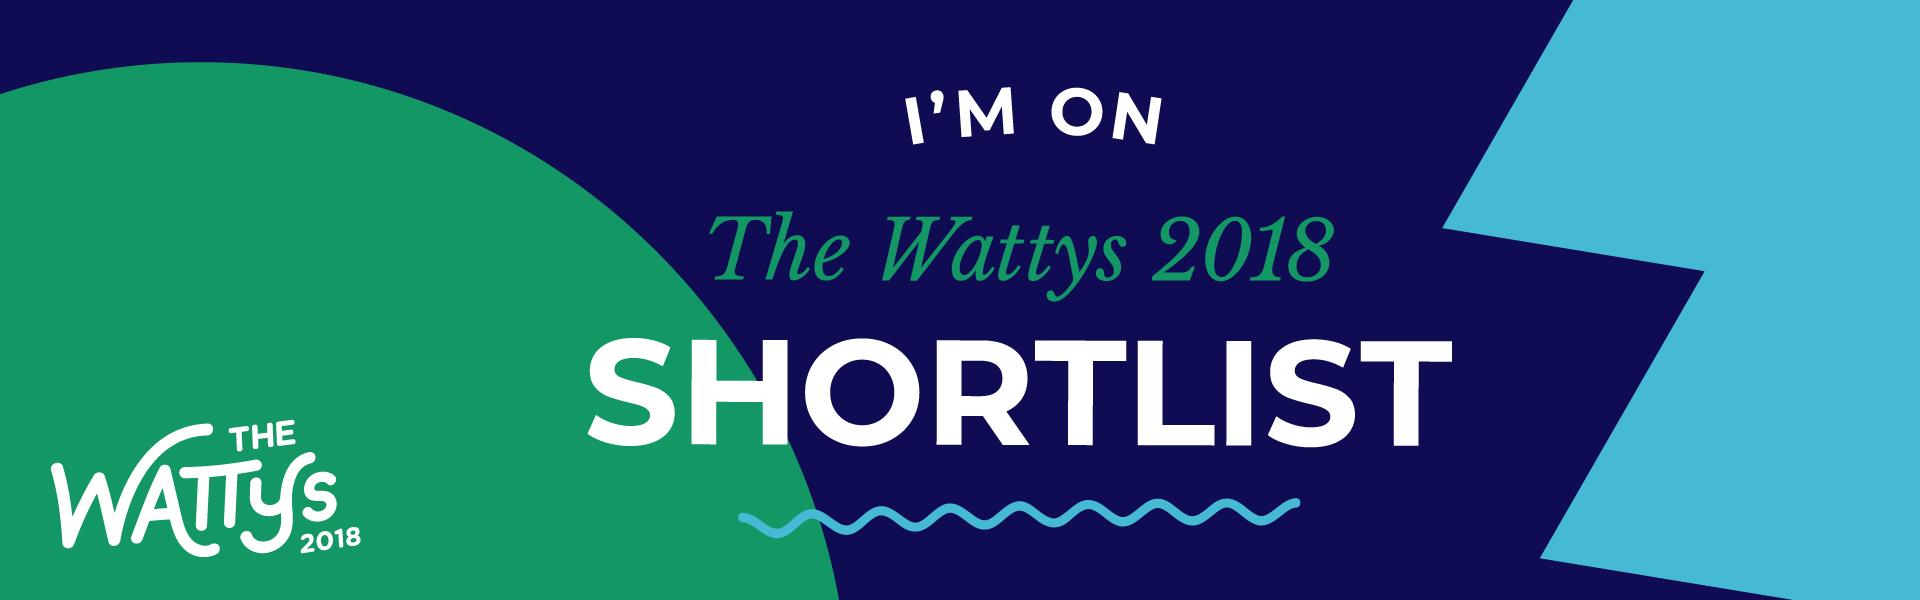 The Wattys 2018 Shortlist